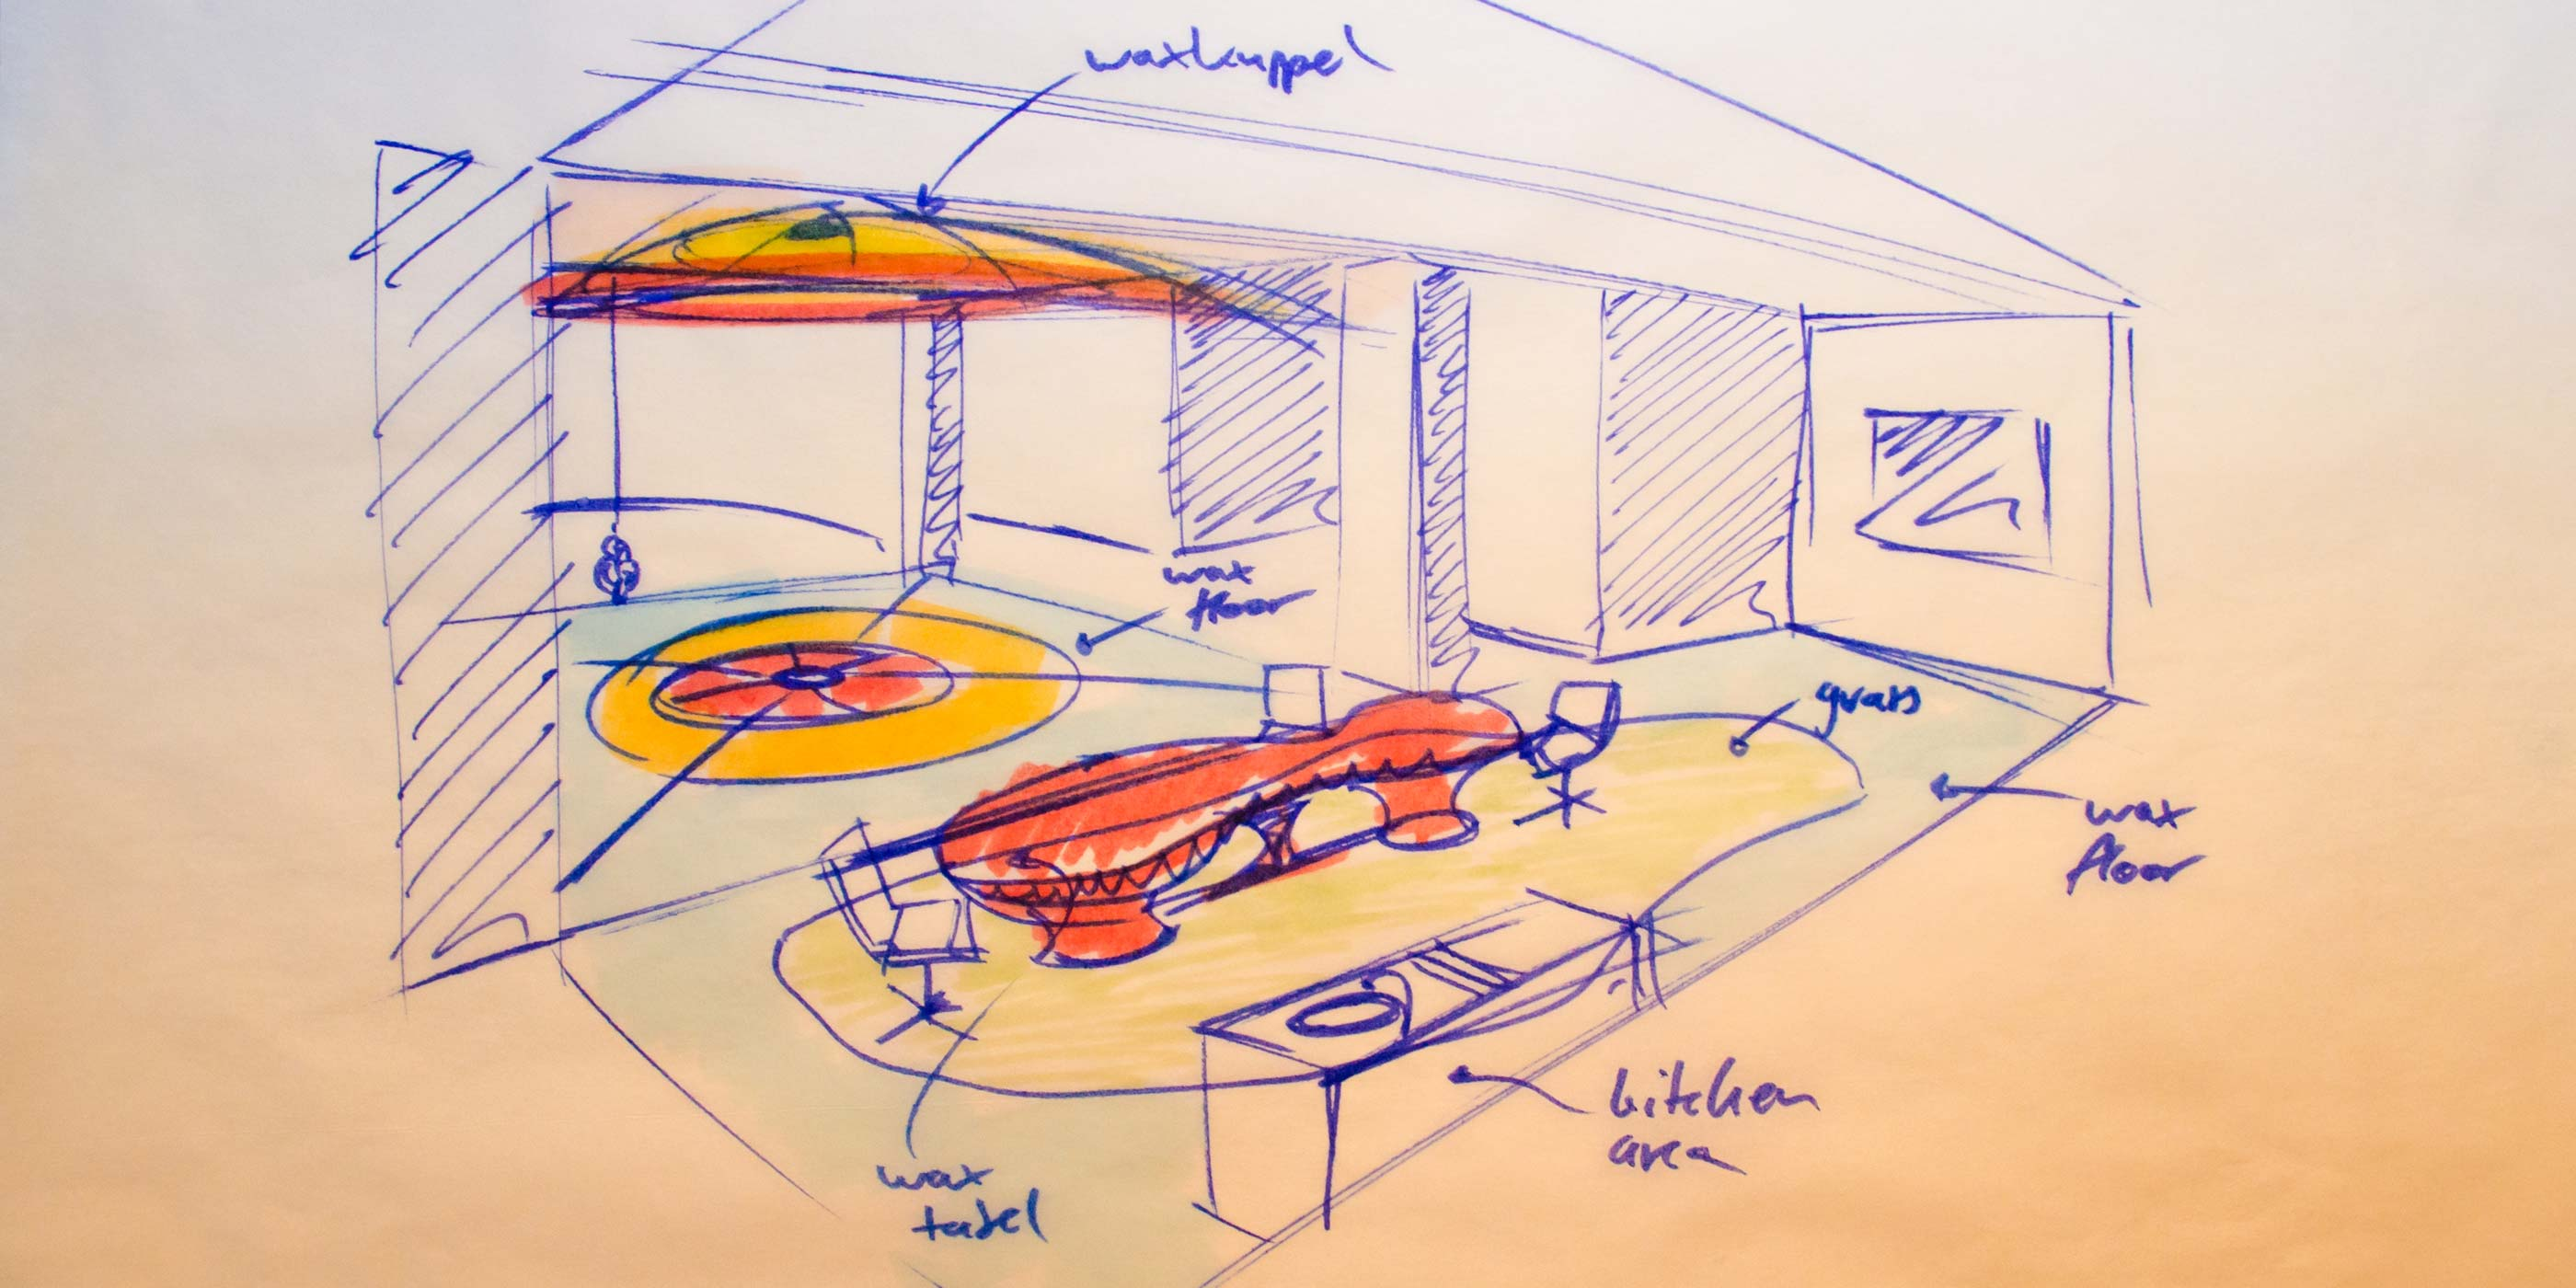 Scenography 01 by WACH designstudio for Alusi Ephemeral Art Atelier in Berlin Kreuzberg